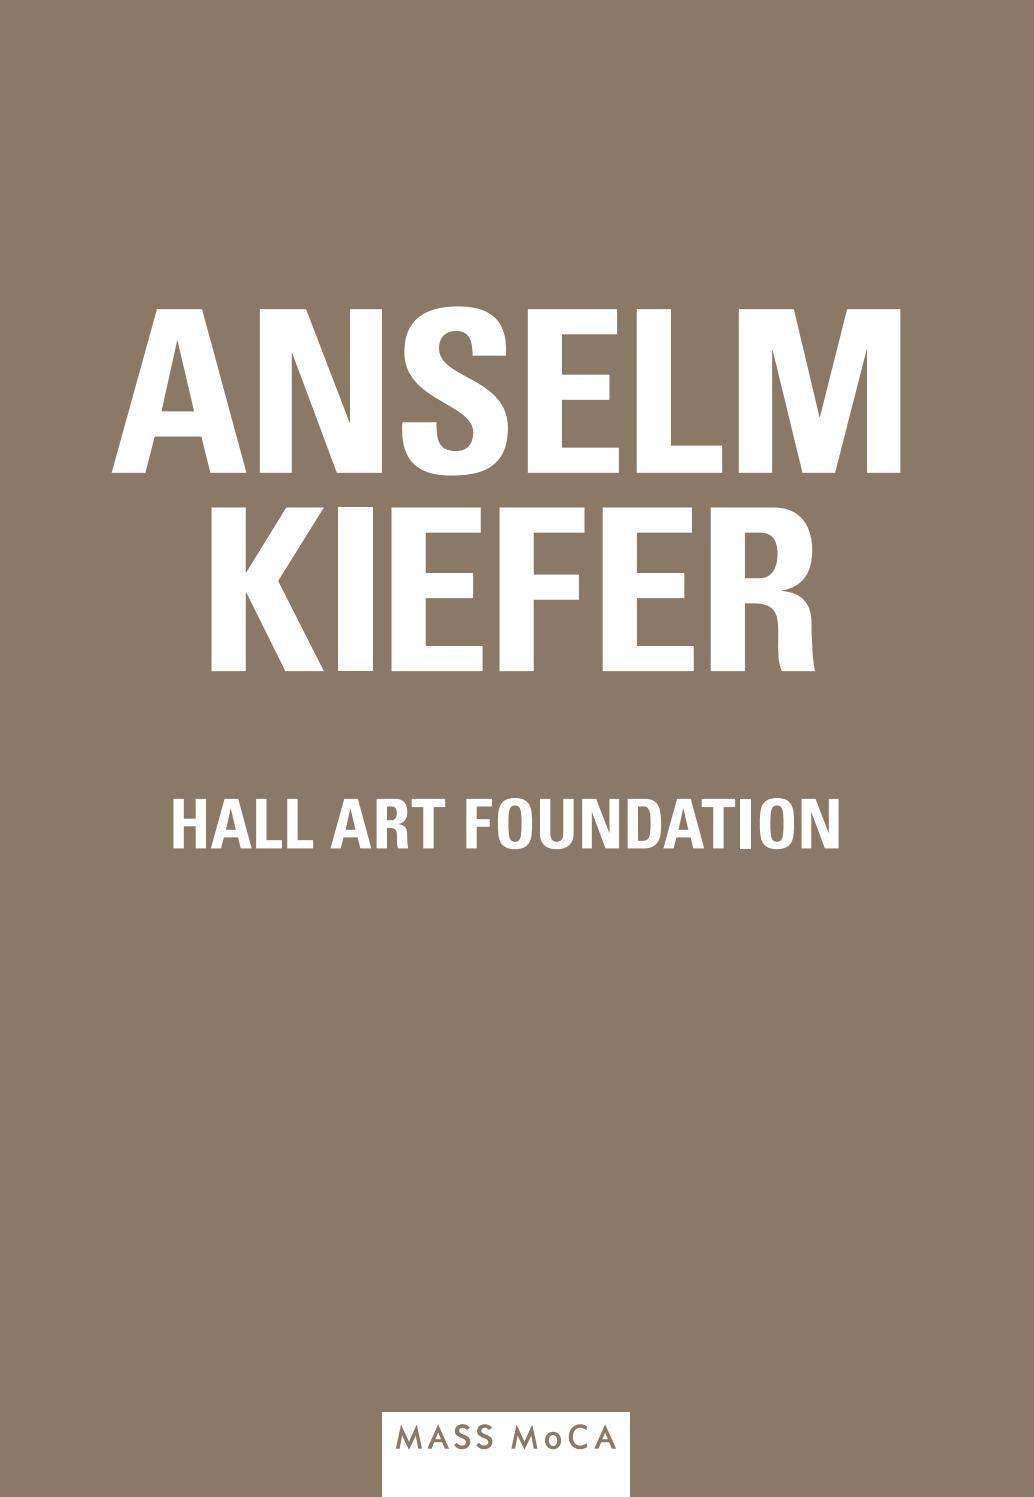 Anselm Kiefer By Mass Moca Issuu Built Wiring Diagram